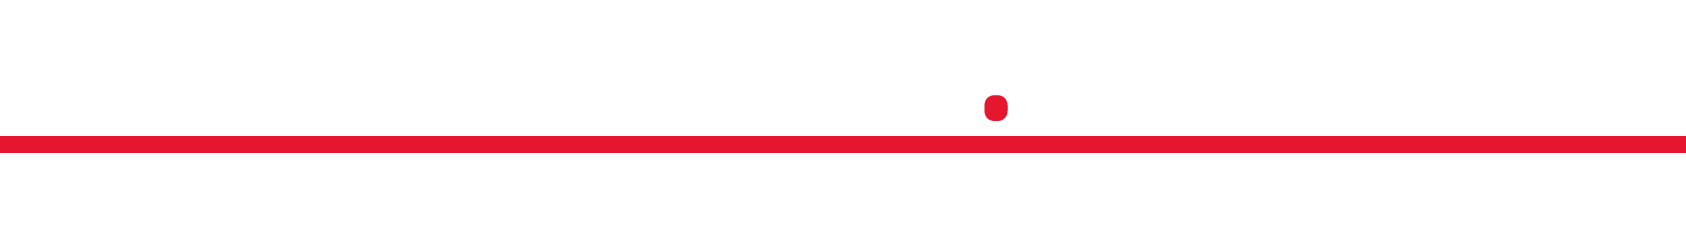 M-CAL Performance Technology